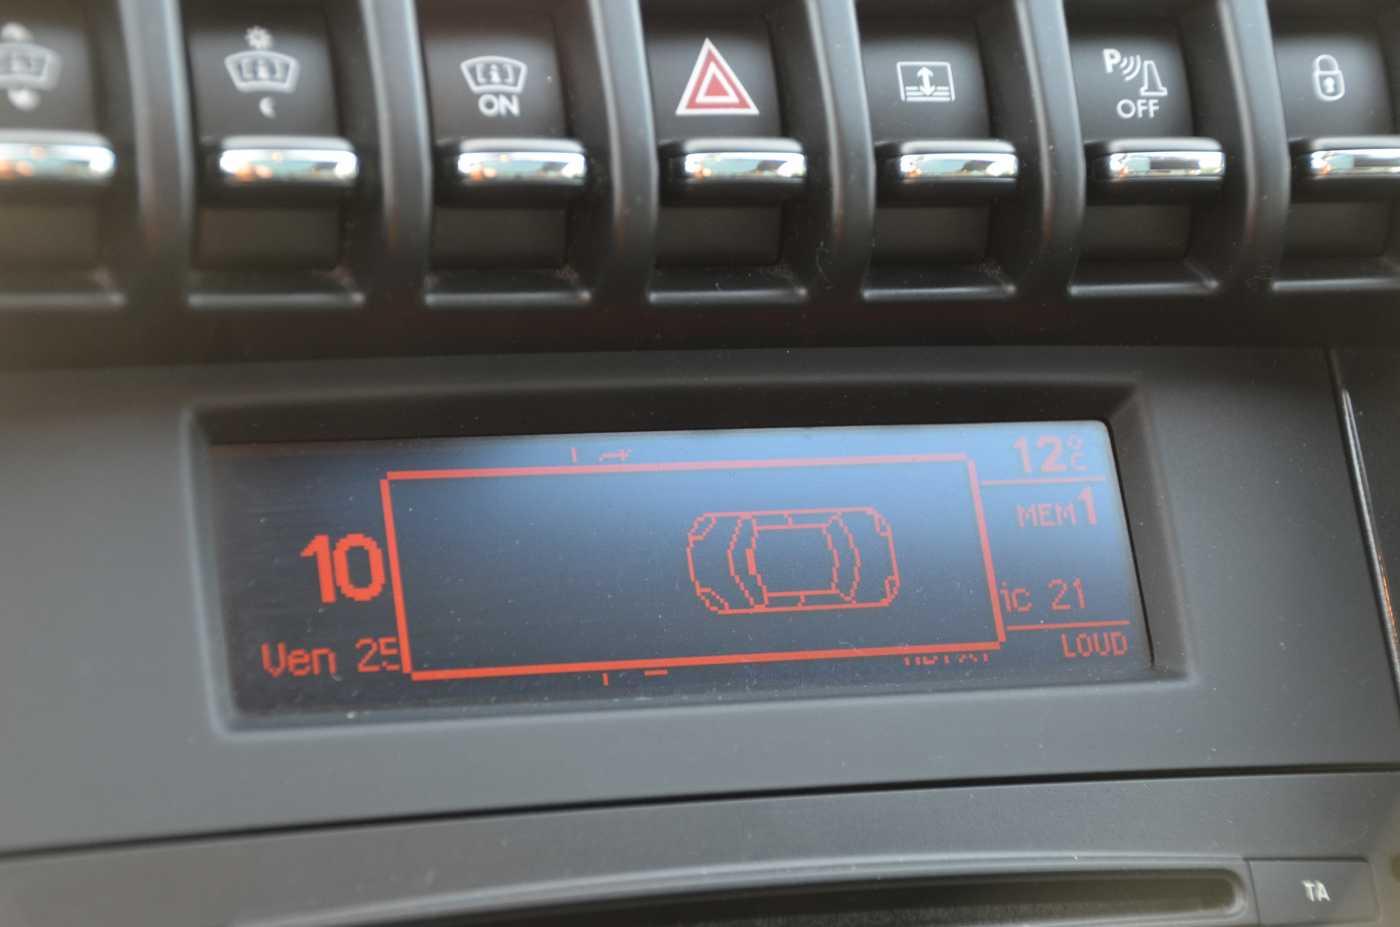 Peugeot 3008 2.0 HDi Allure 150CV 11/13